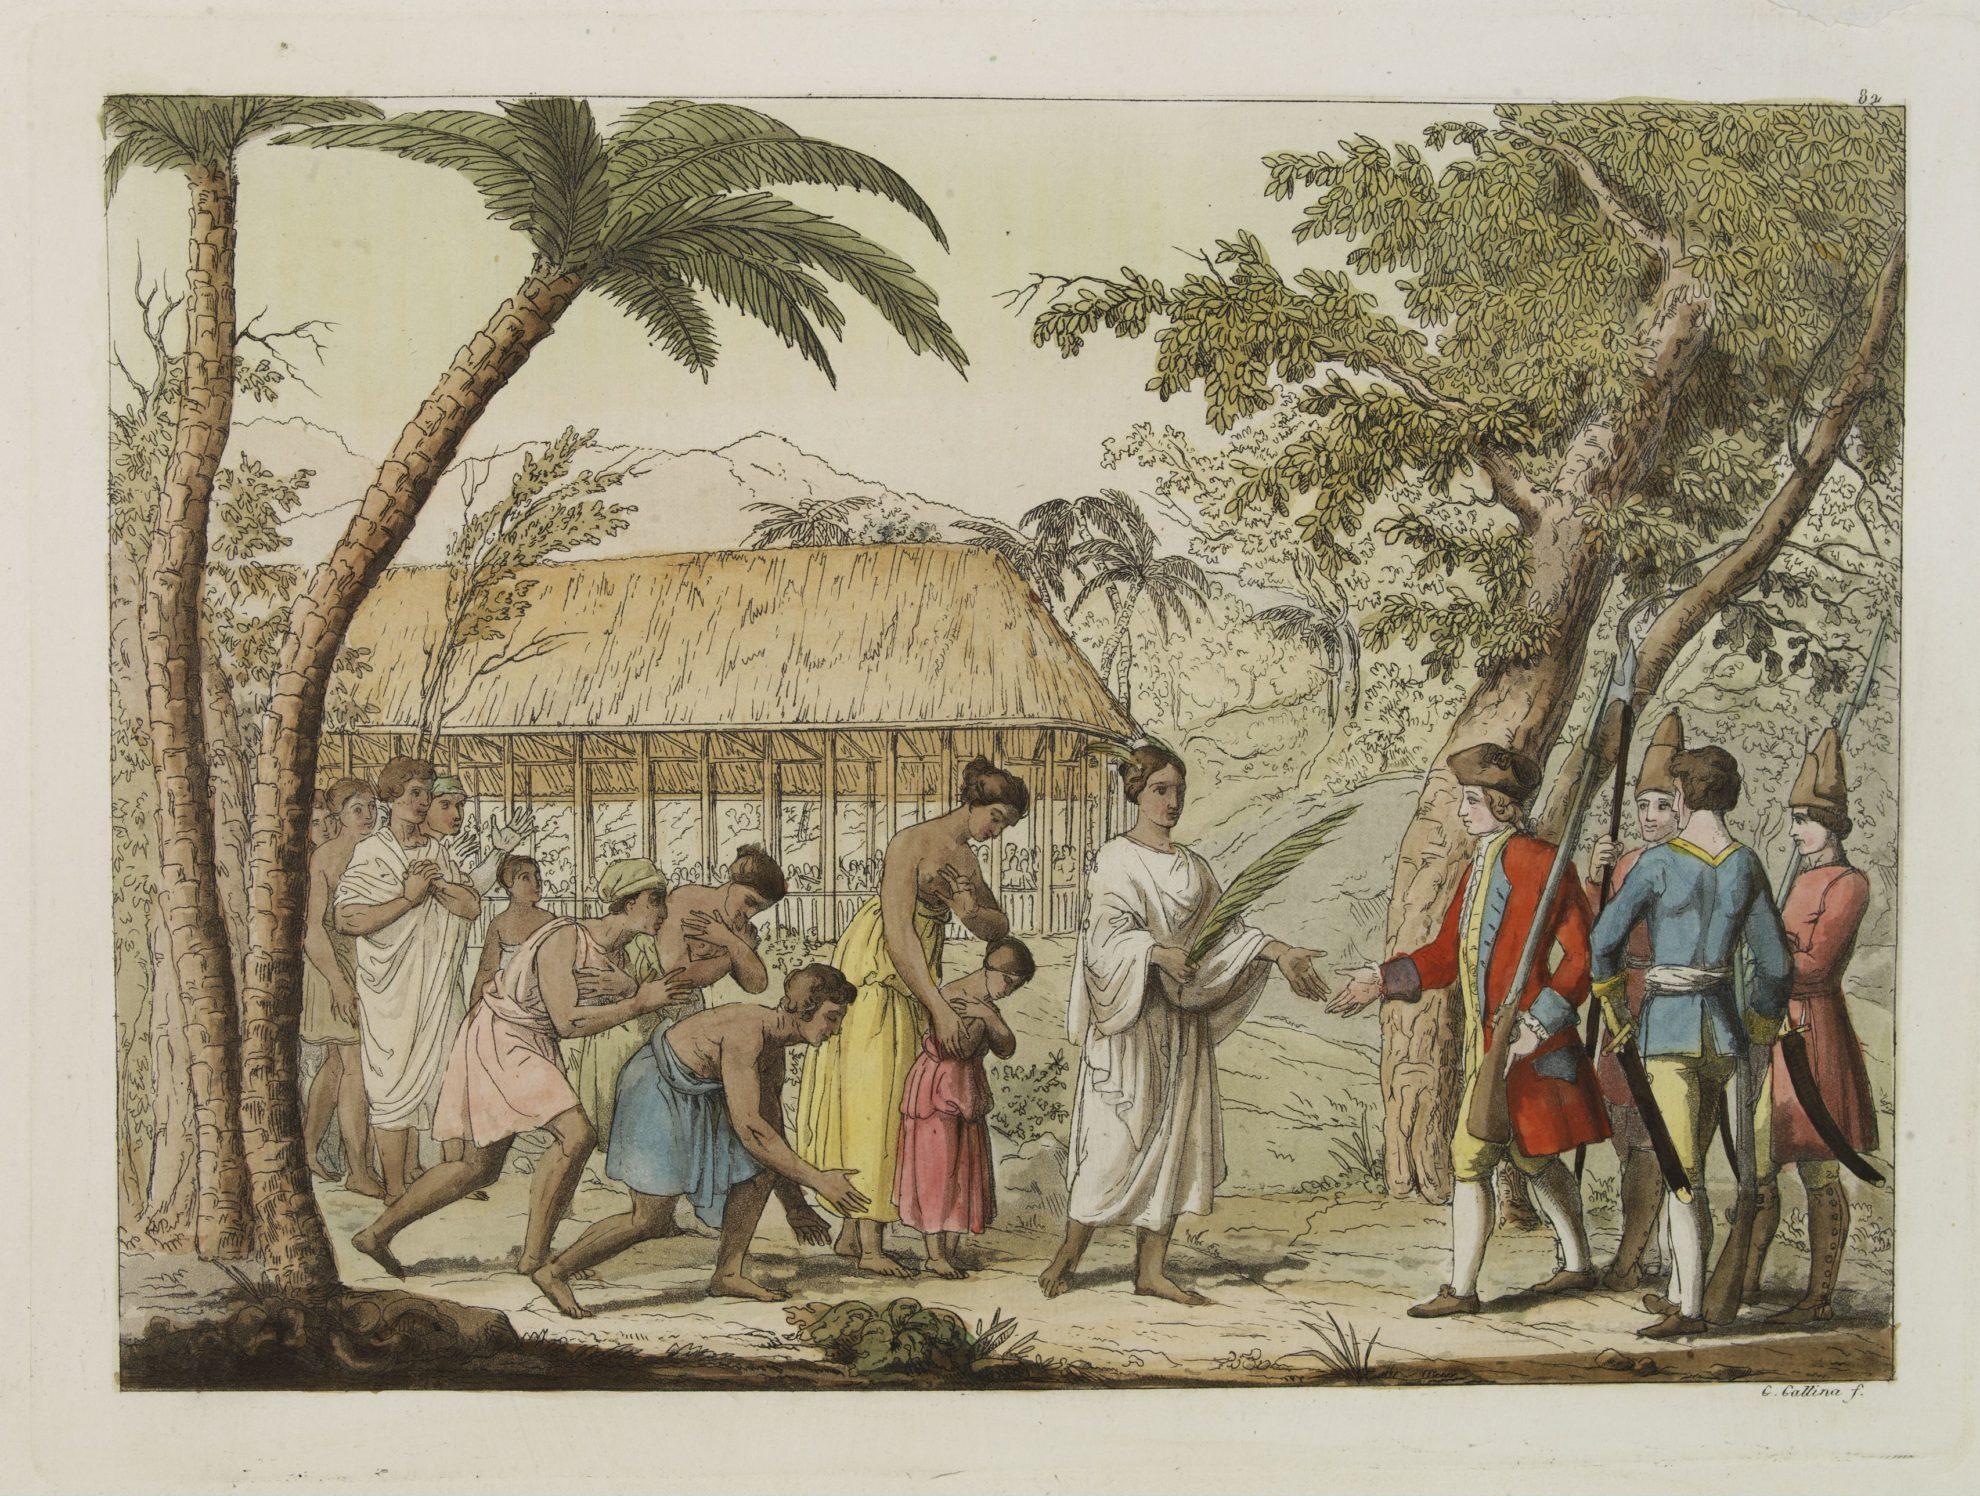 Королева Oberea приветствует капитана Wallis. Tahiti Le Costume Ancien et Moderne by Giulio Ferrario 1827. Полинезия